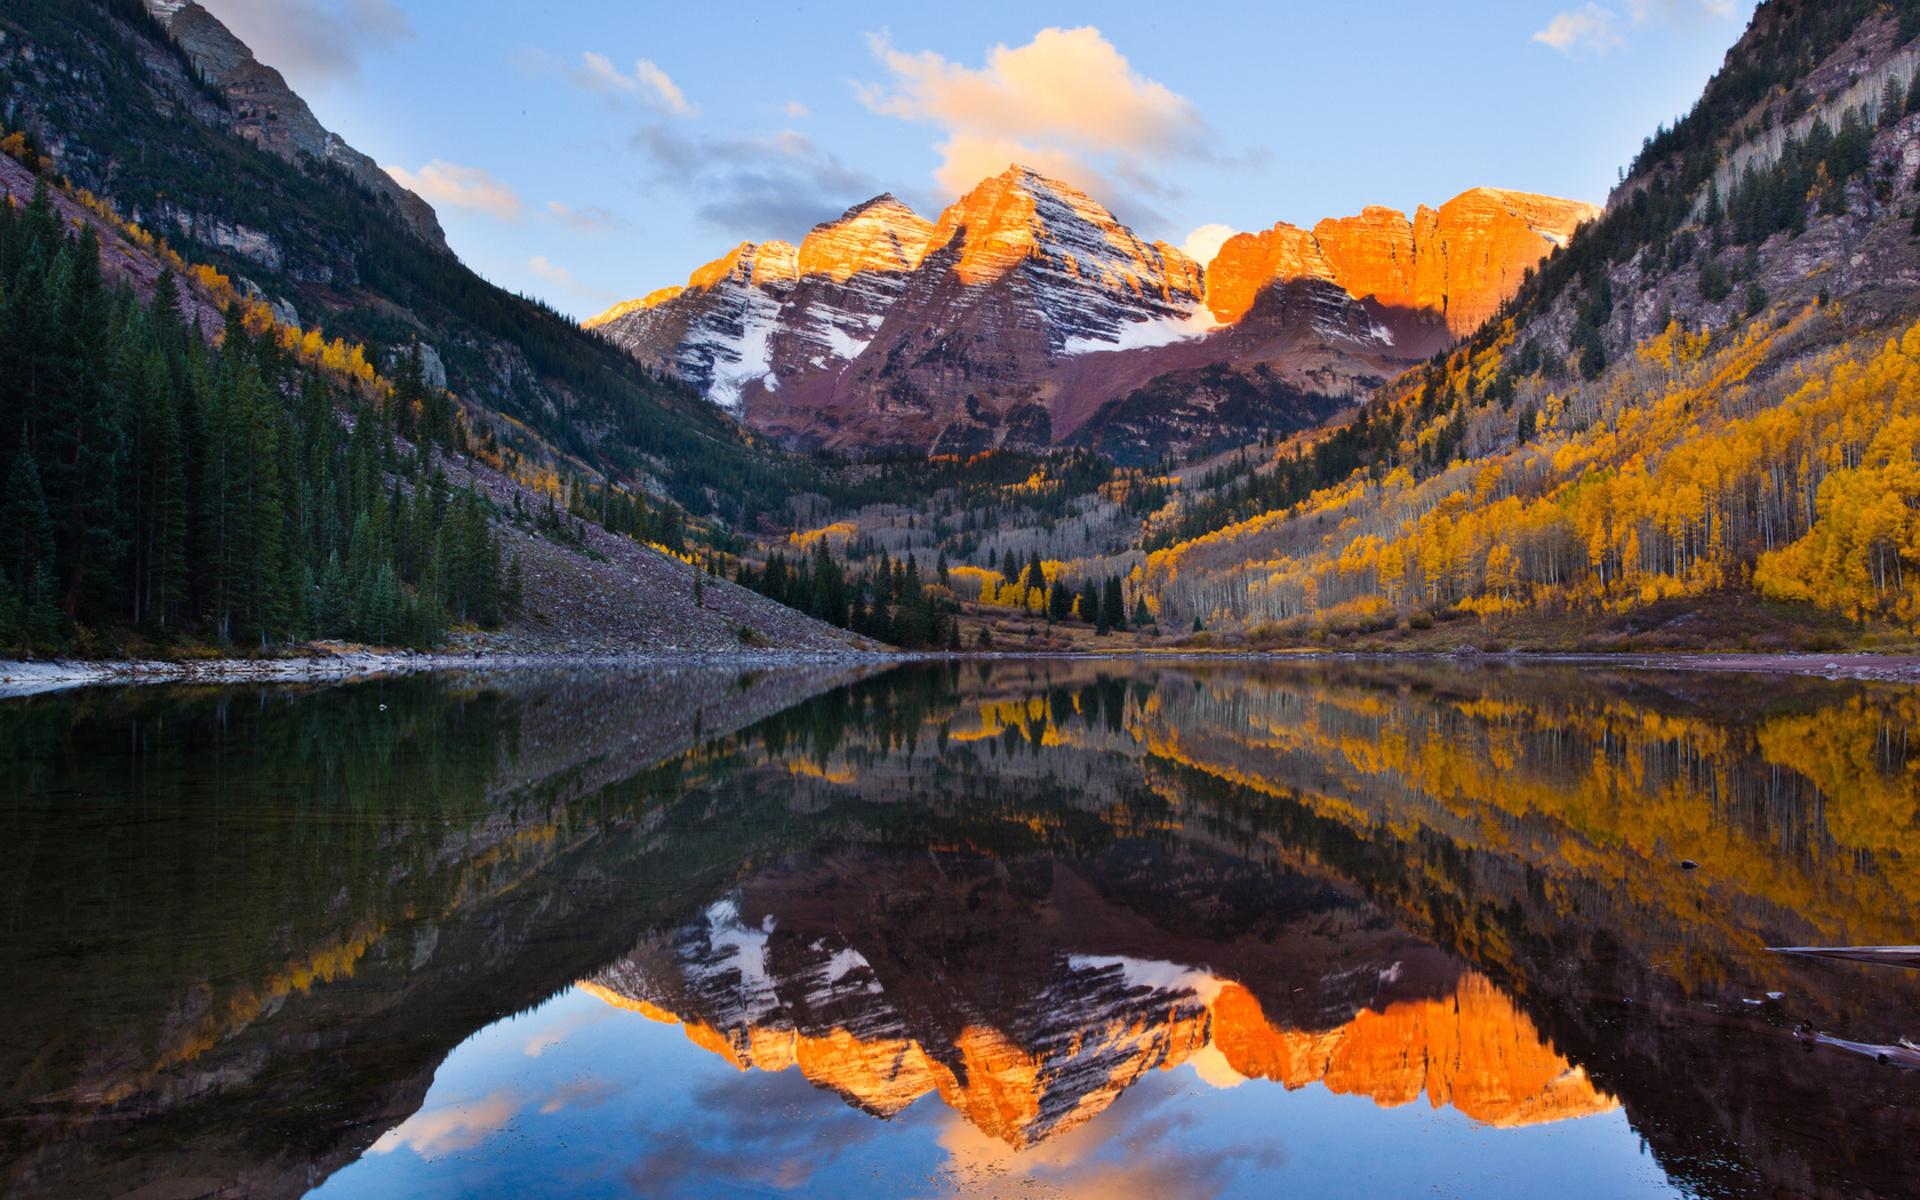 Fall Mountain Scenes Wallpaper Mirror Reflection By Yogi Arora Desktop Wallpaper